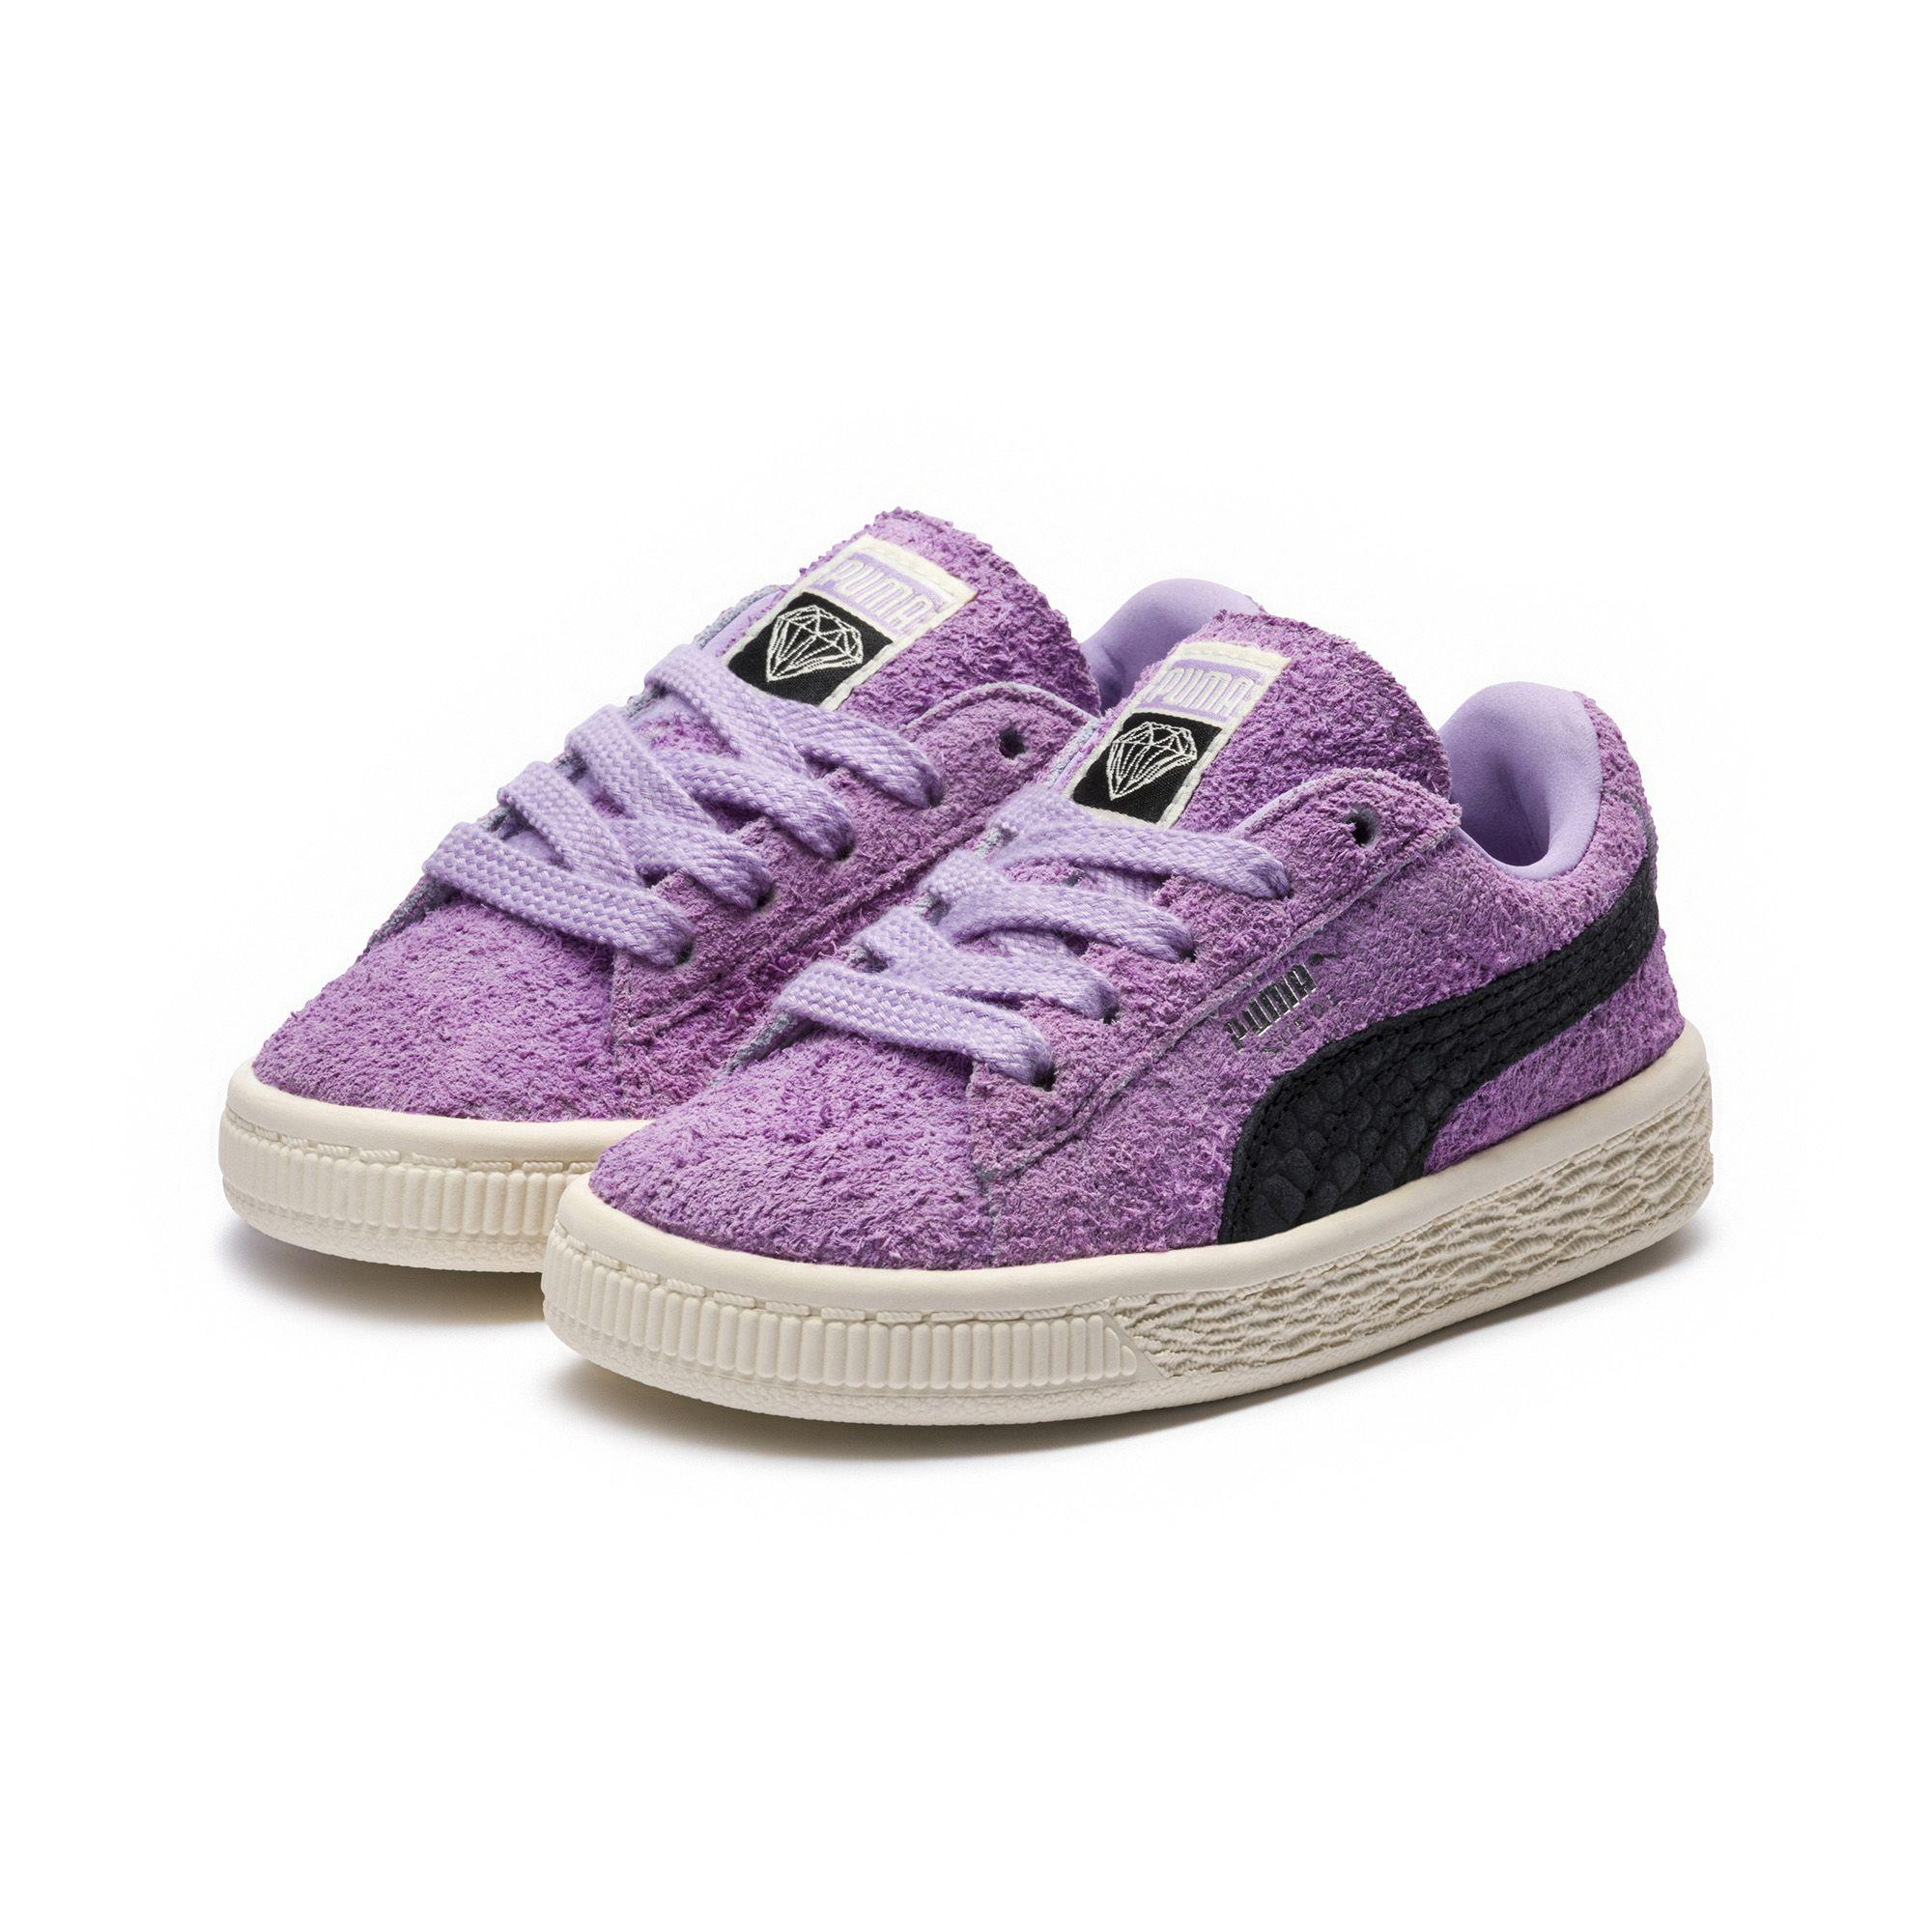 7ae06103f52 Lyst - PUMA X Diamond Suede Infant Sneakers in Purple